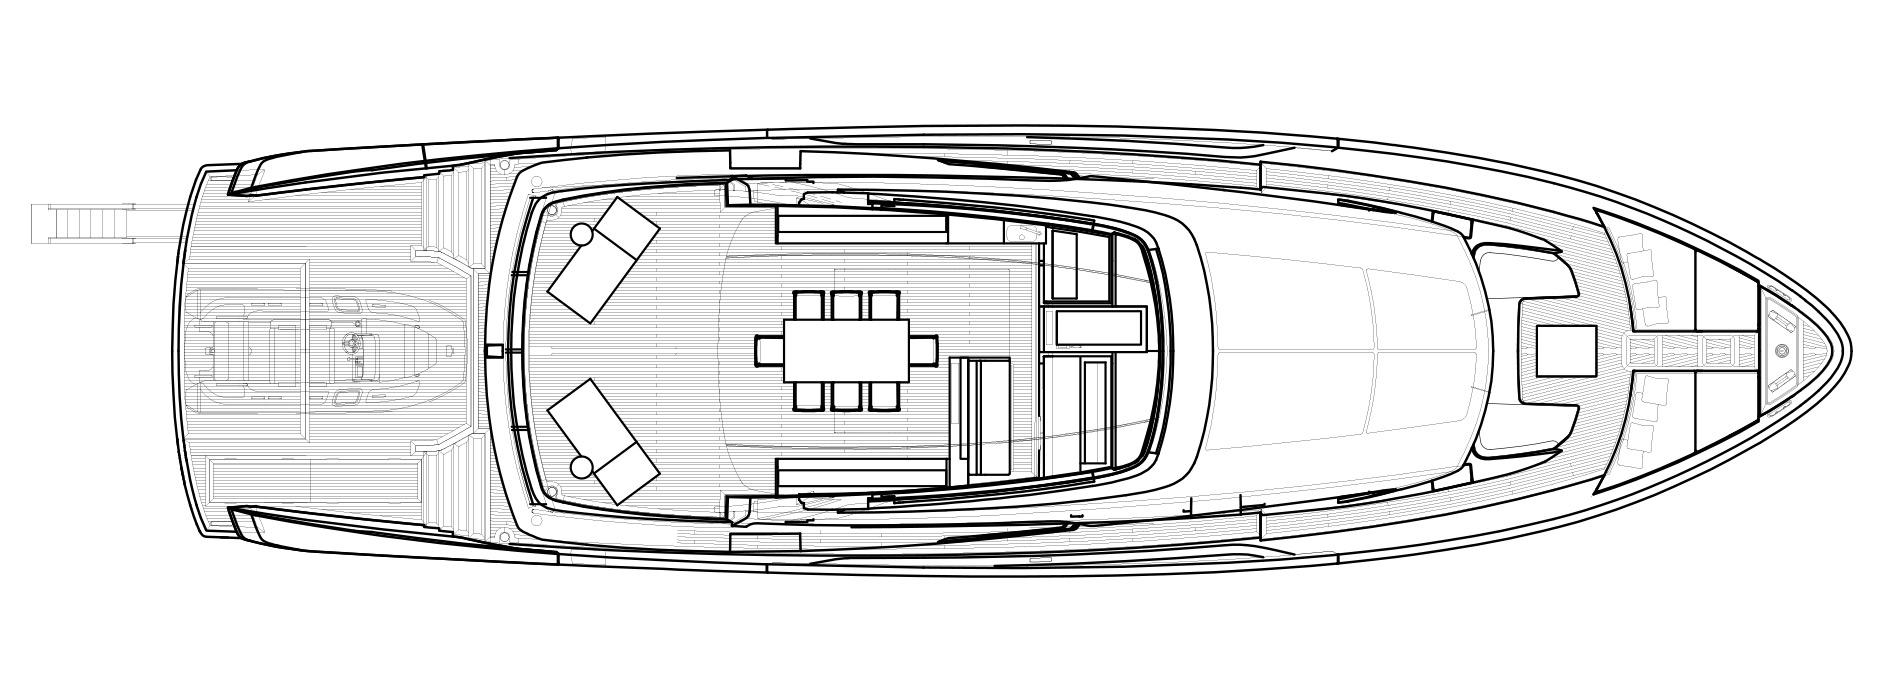 Sanlorenzo Yachts SX88 Flying bridge Version Lissoni